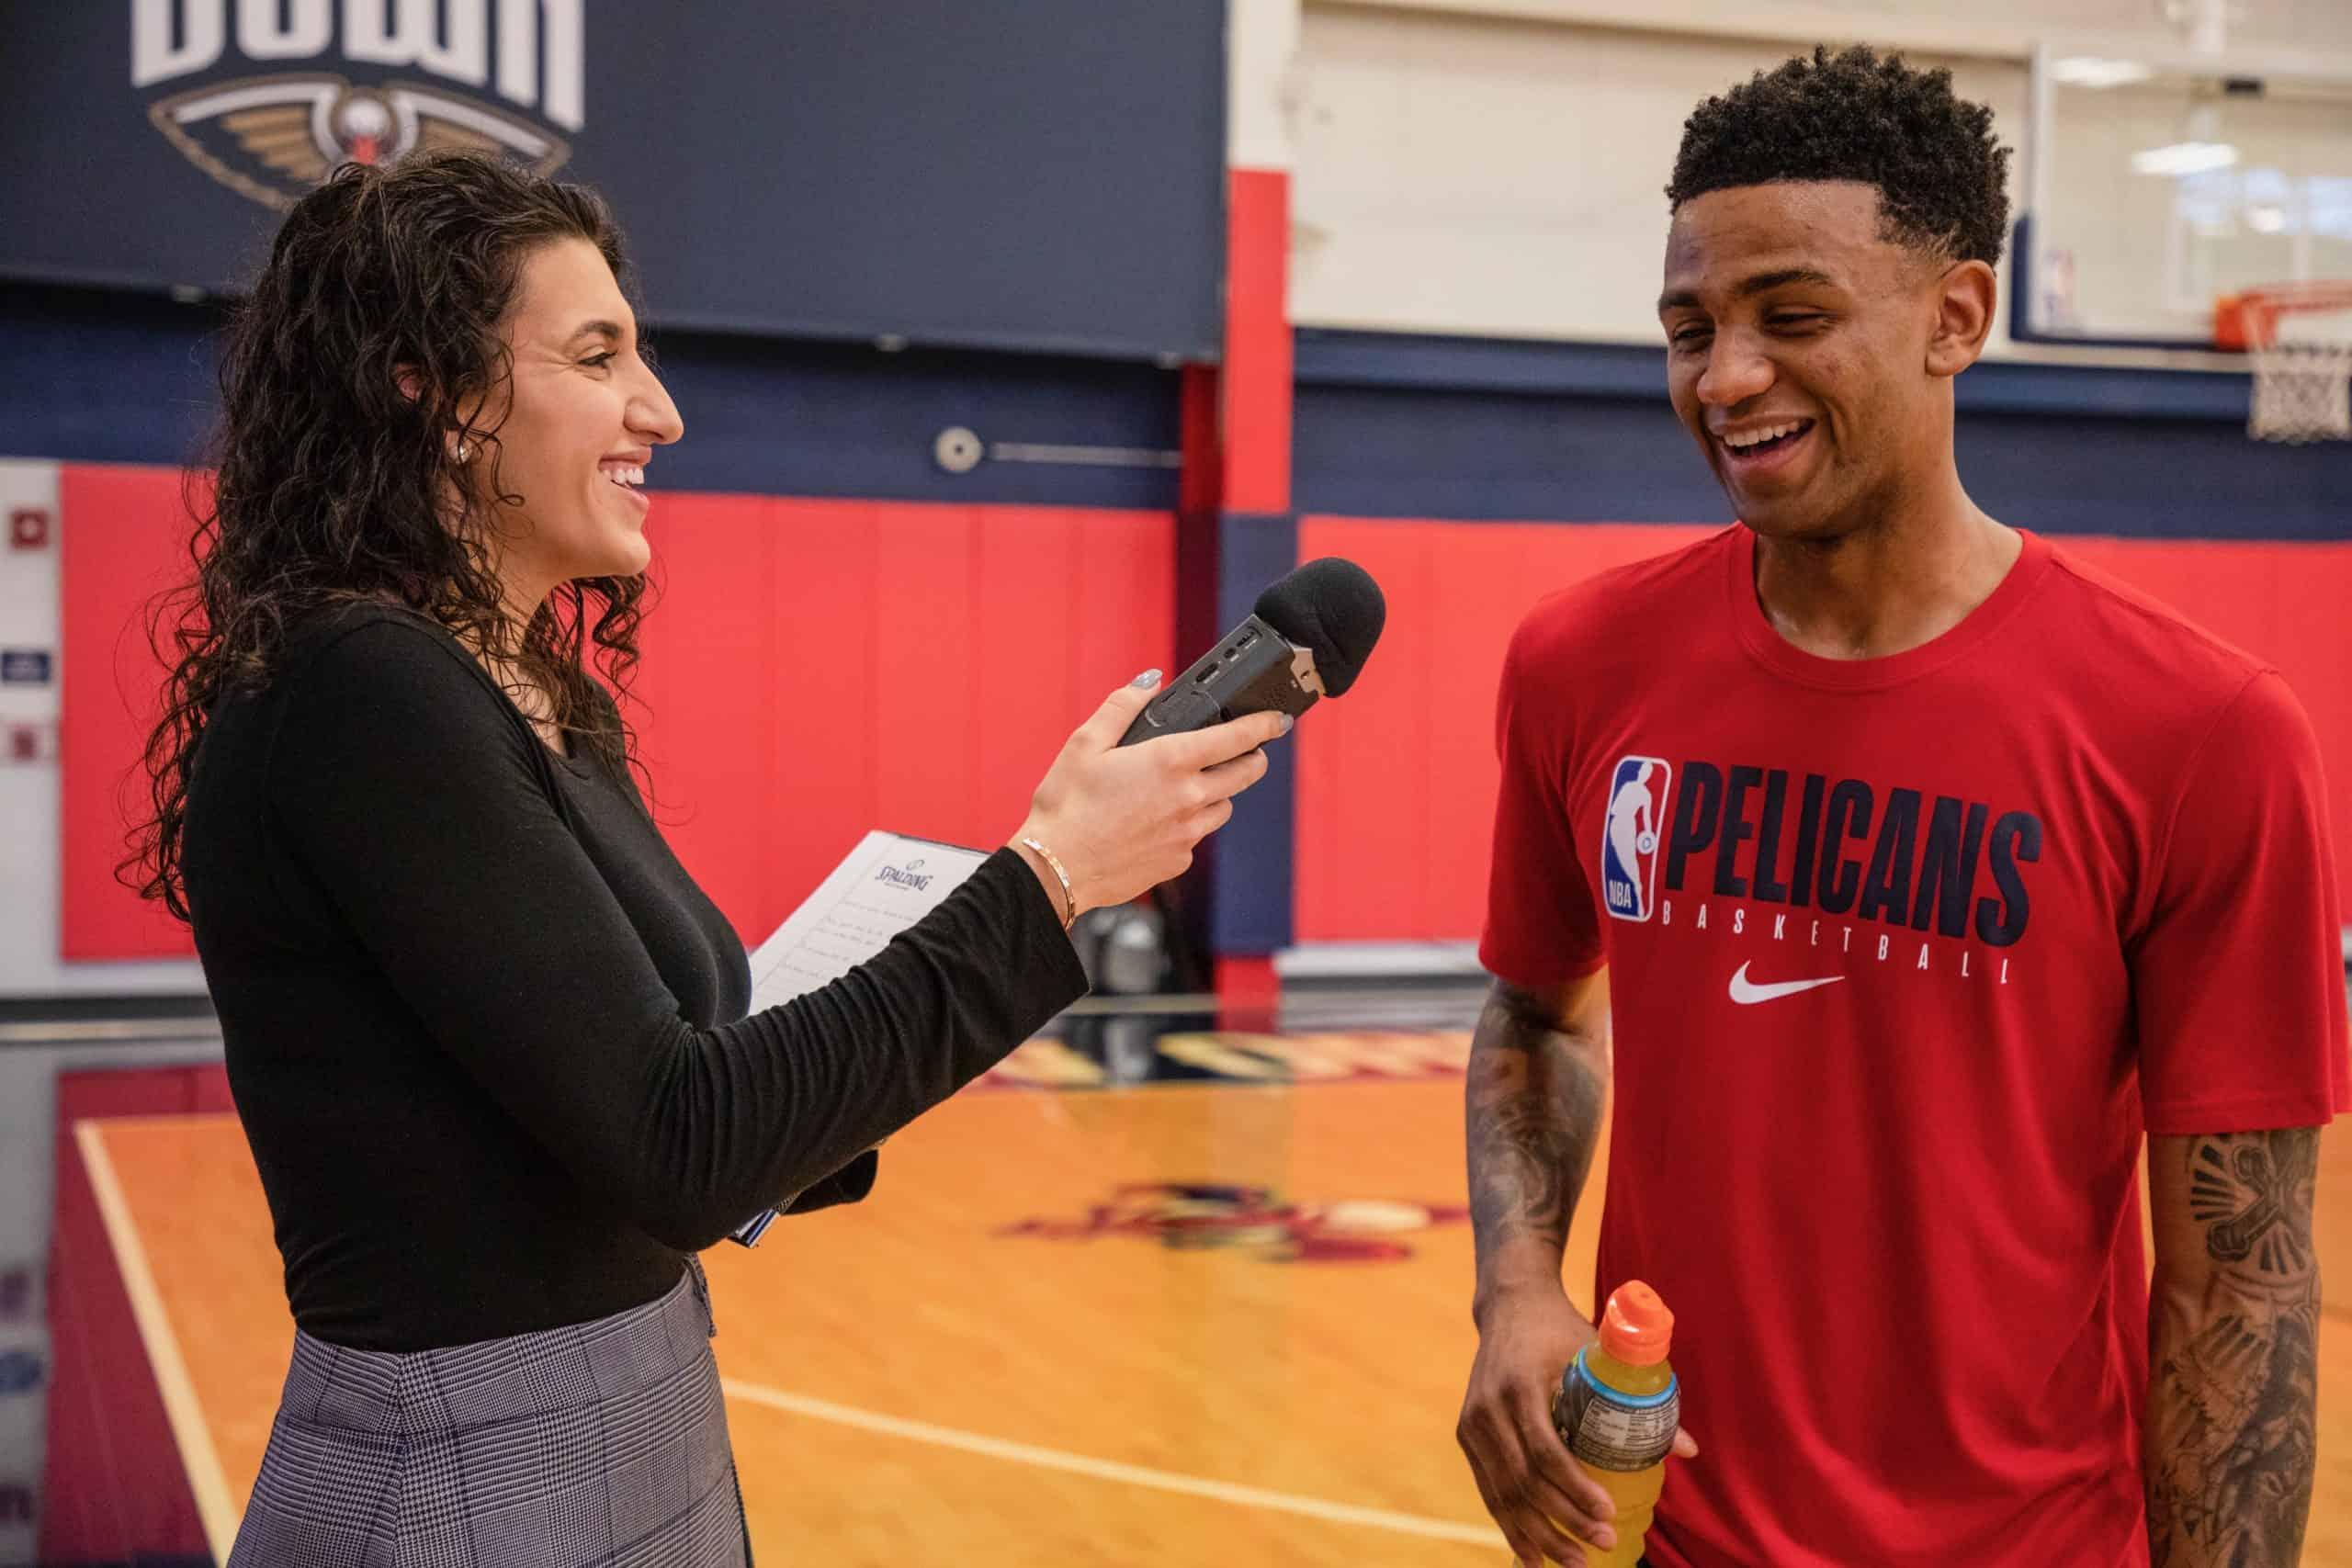 Women In Sports: Caroline Gonzalez talks rise to becoming Saints team reporter